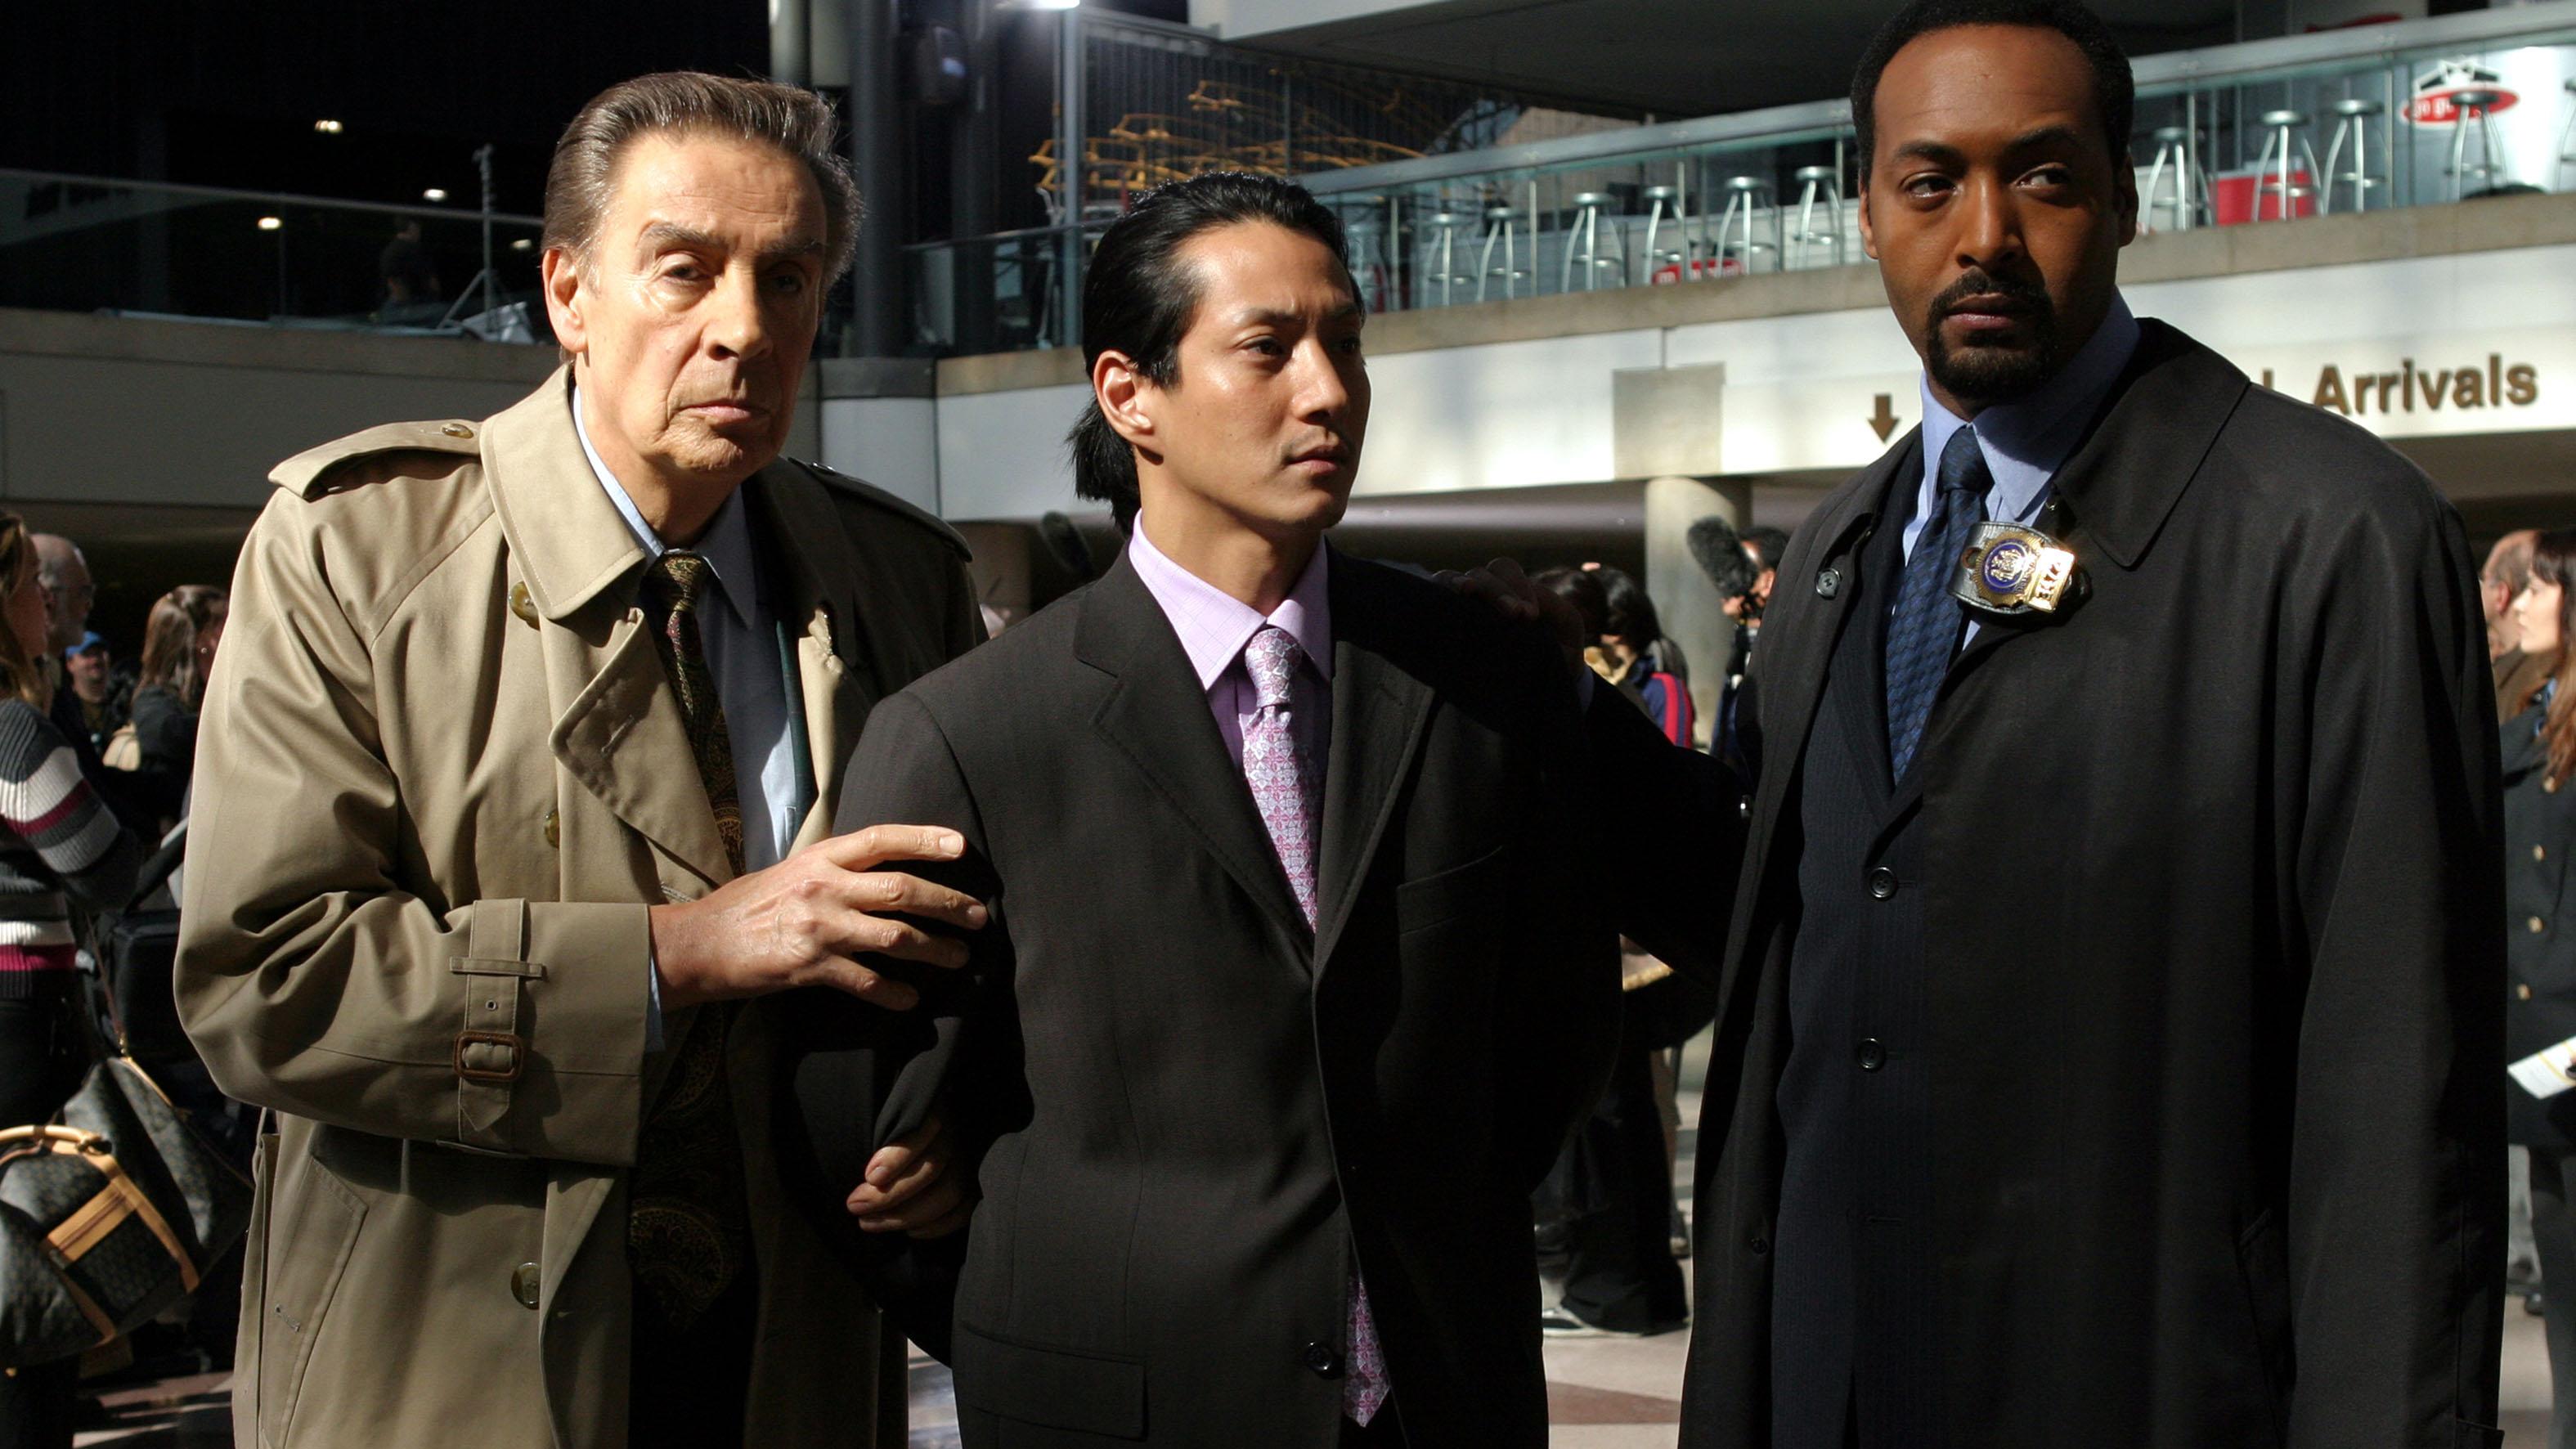 Law and Order Season 21